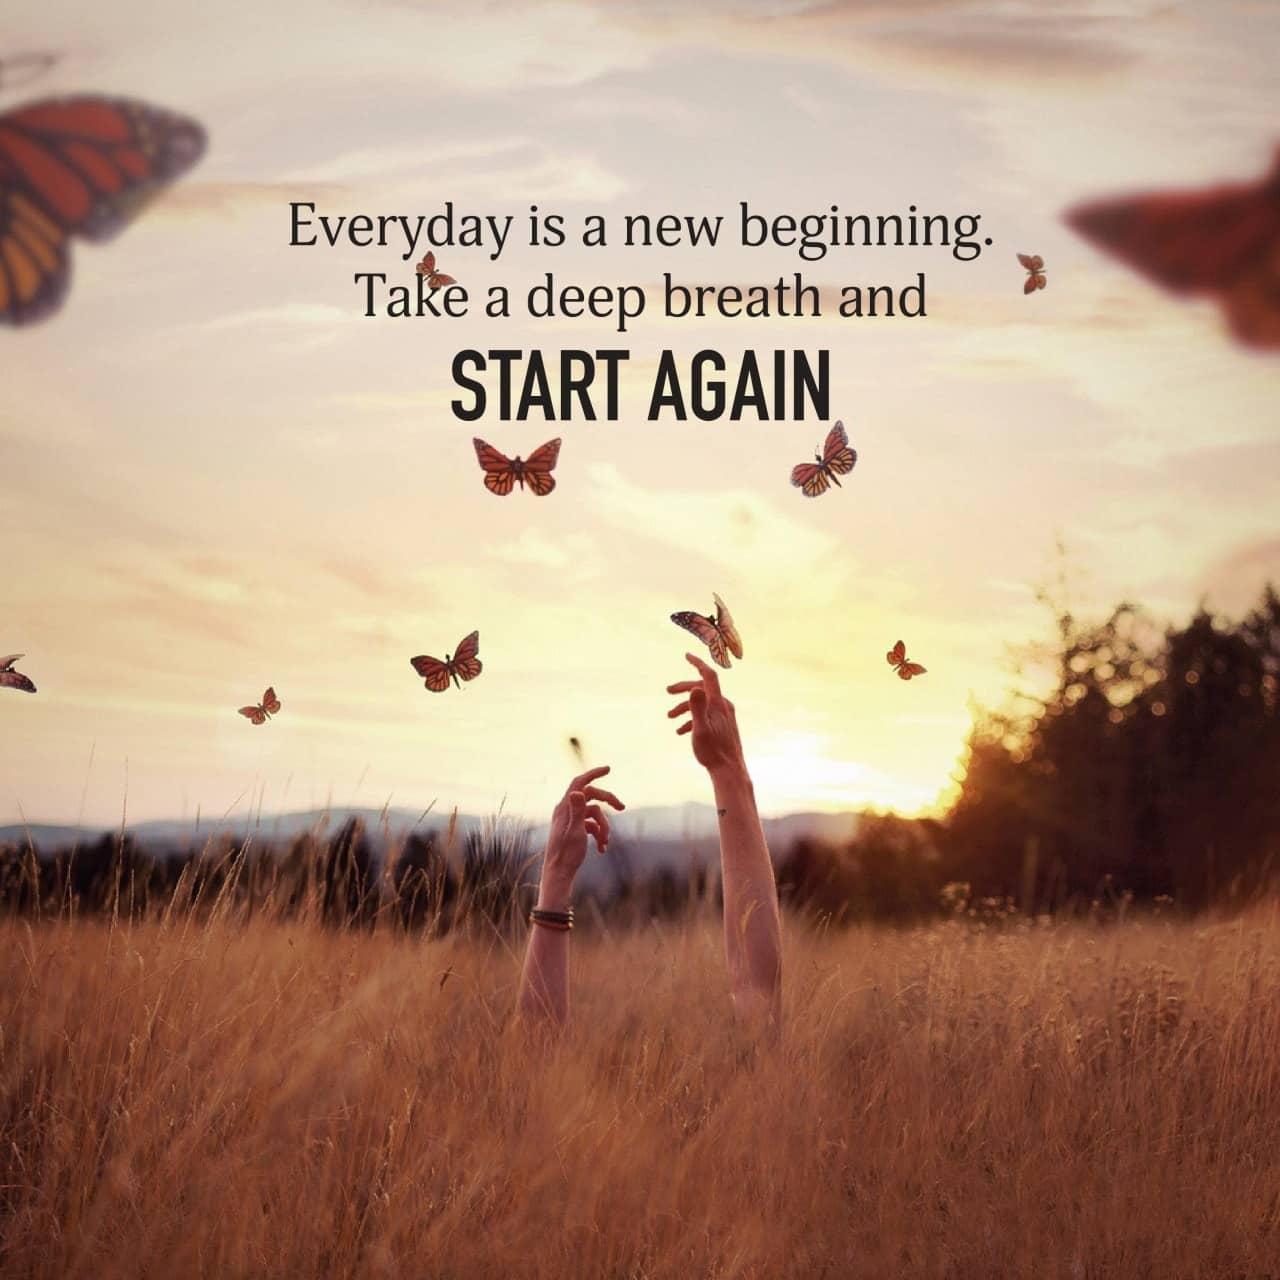 affirmations-for-new-begining-expandedinspiration..com-min